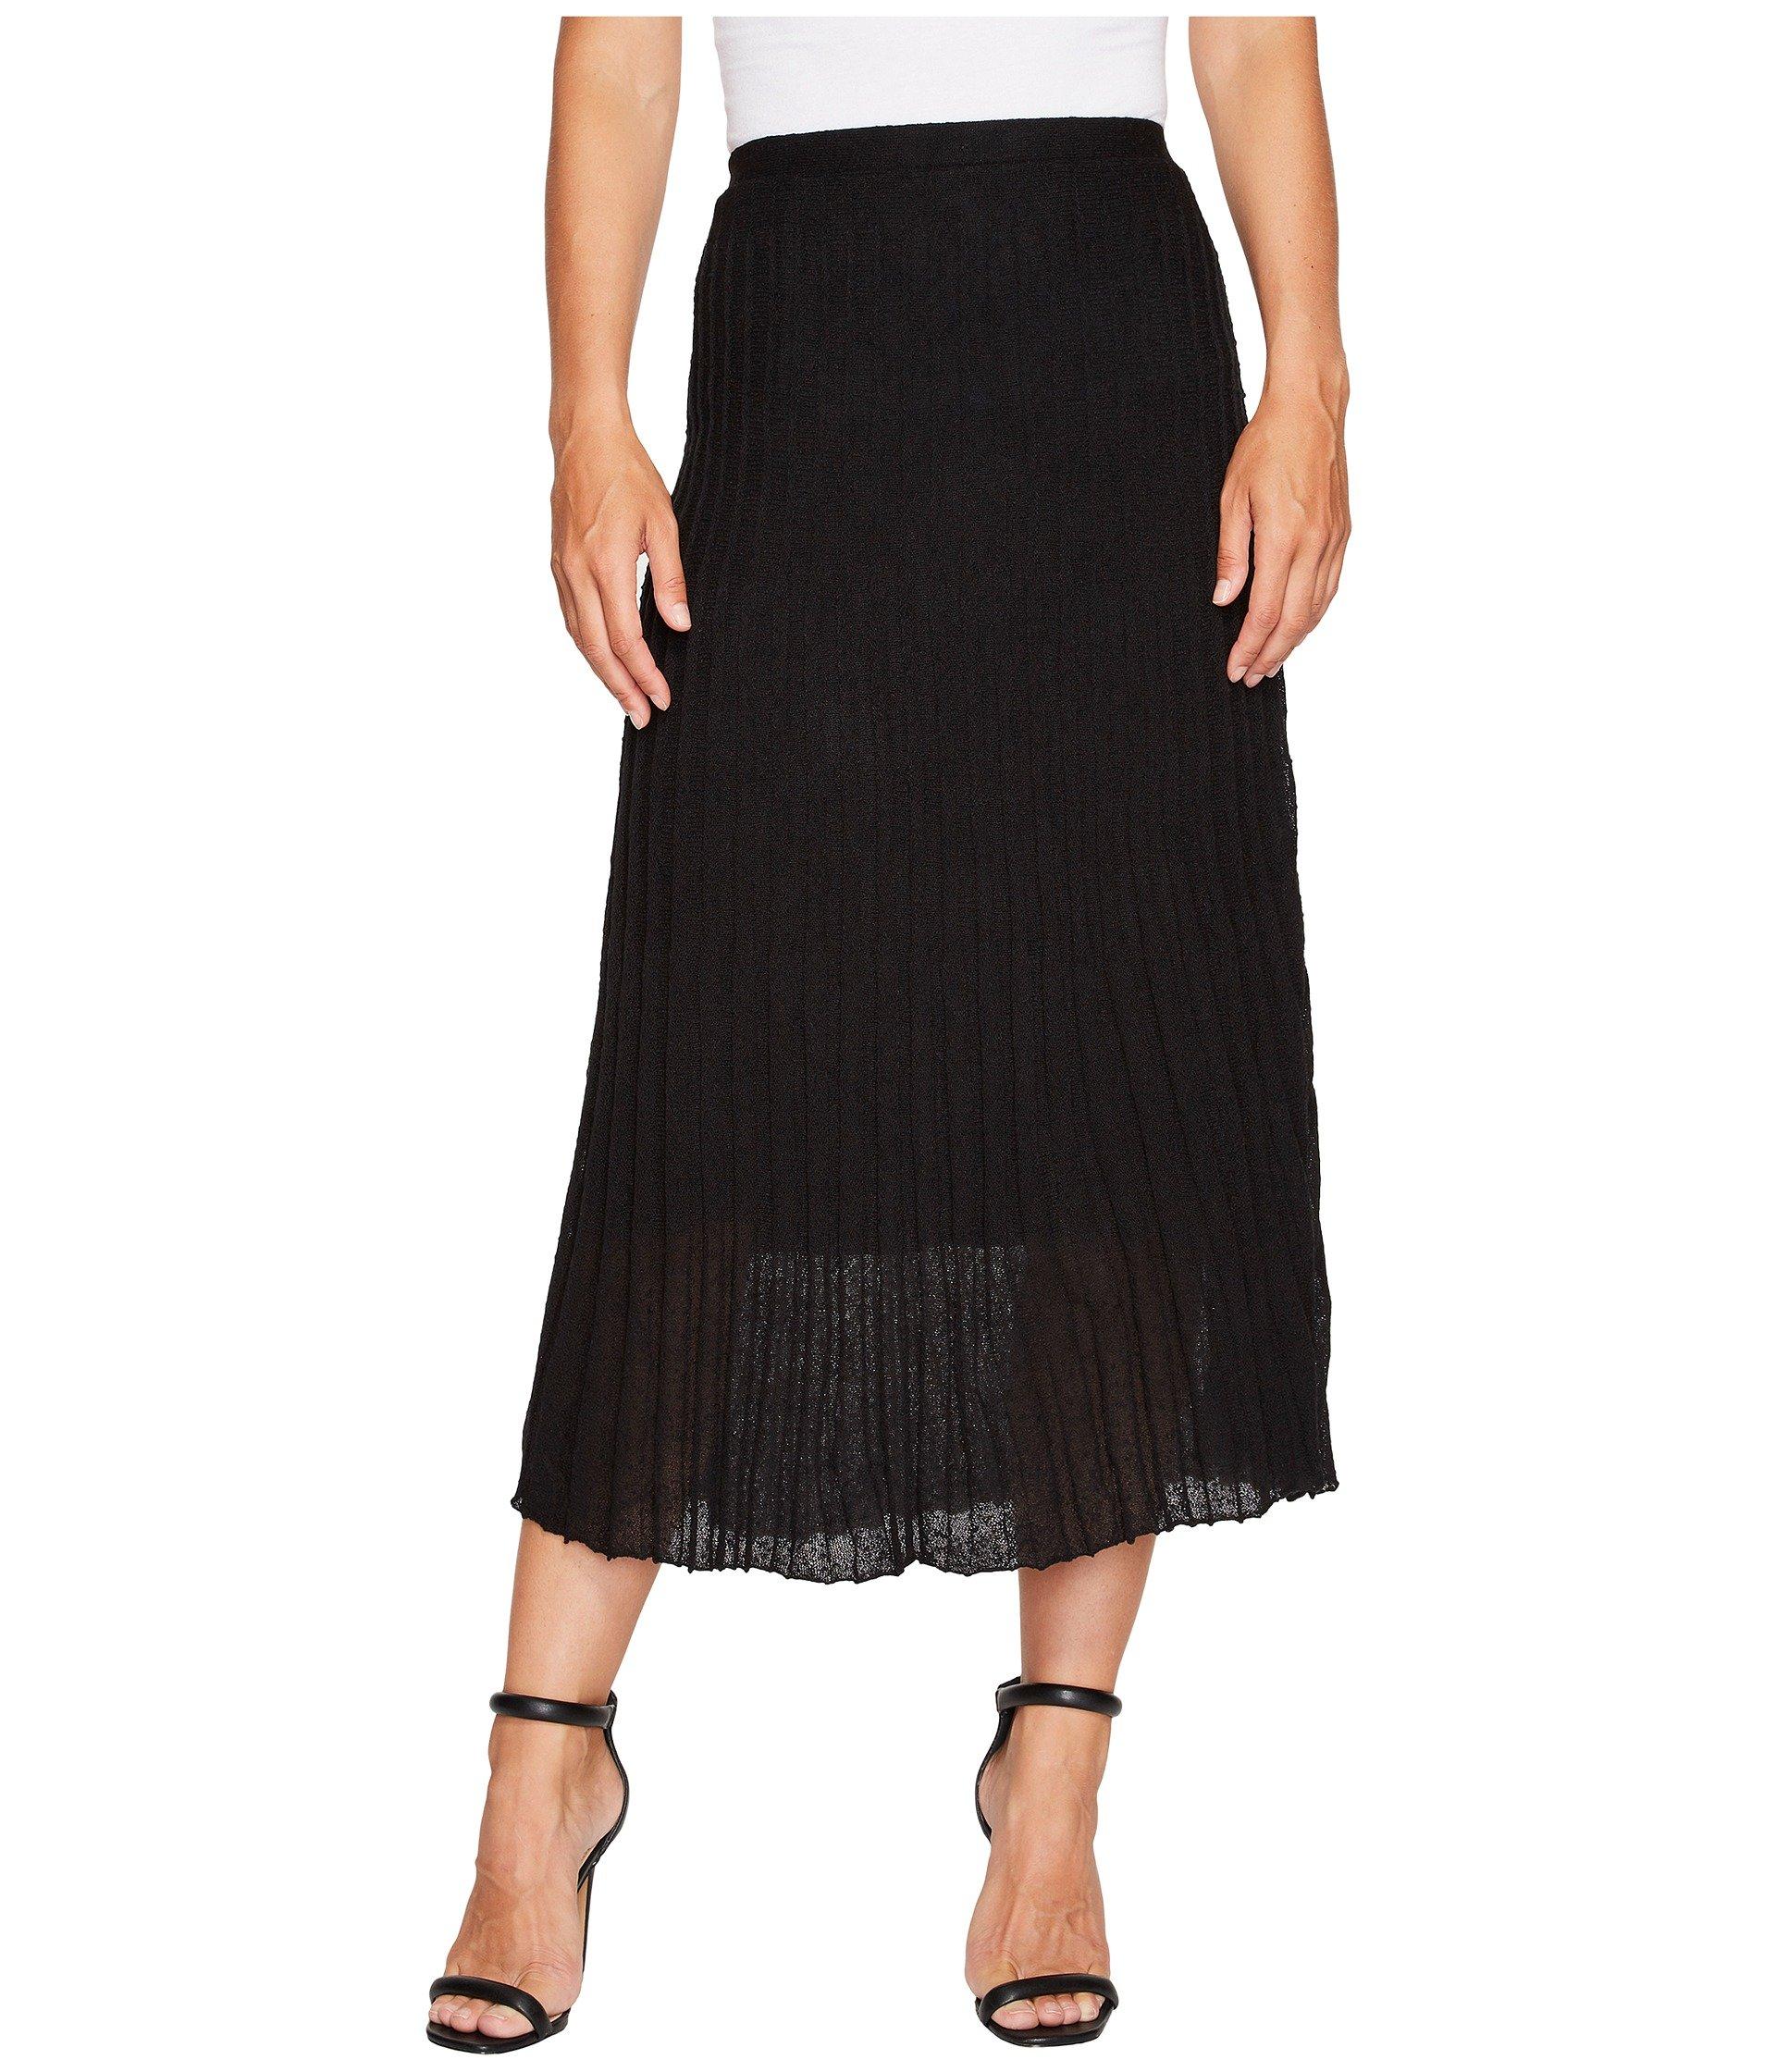 Fluid Knit Skirt, Black Onyx